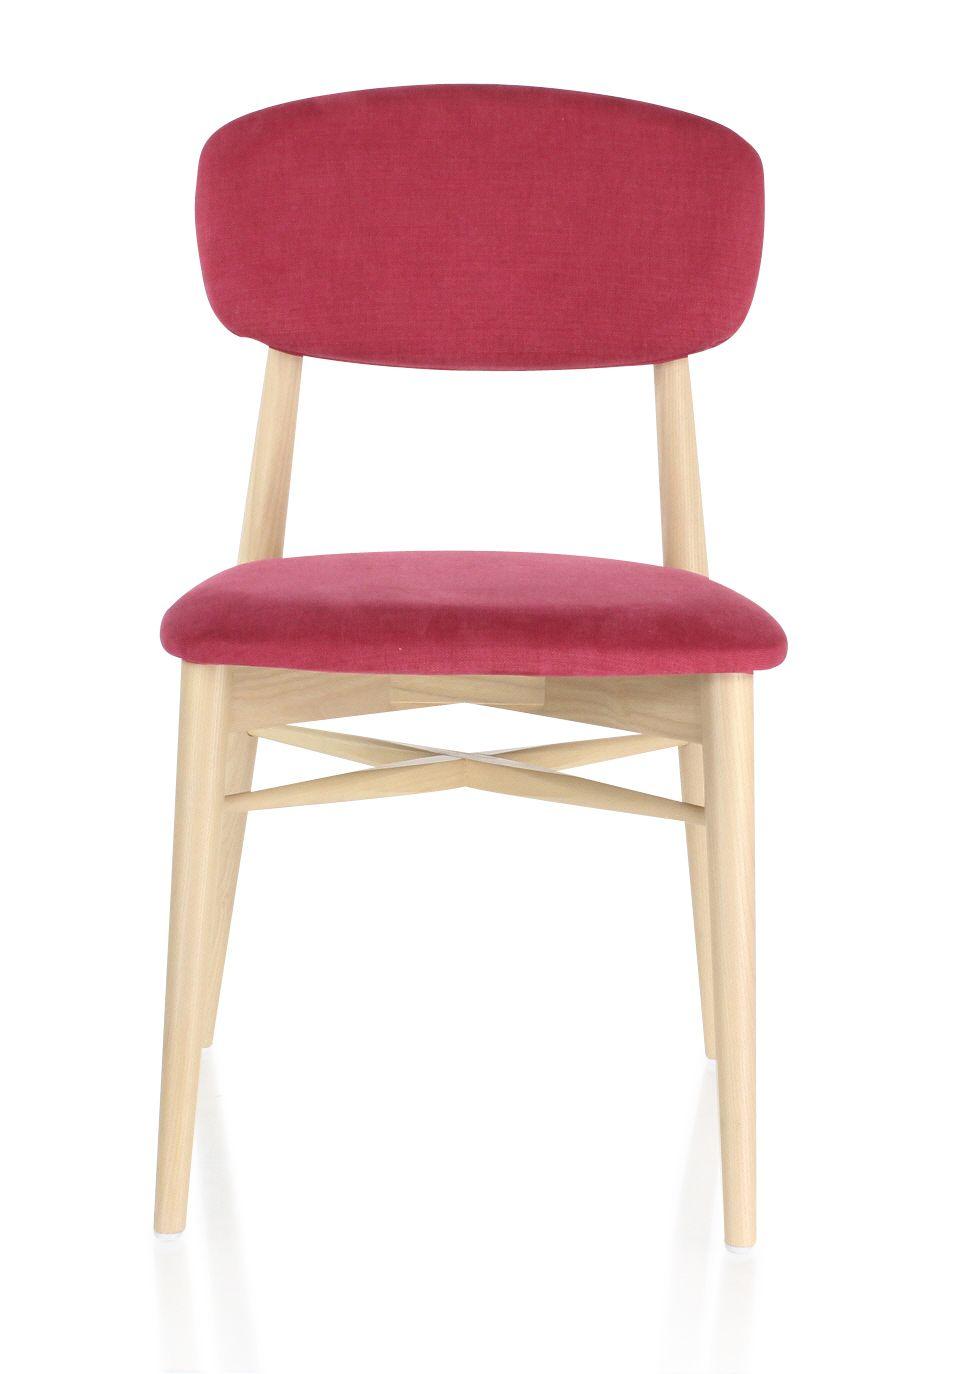 Epingle Sur Chaise Design By Saulaie